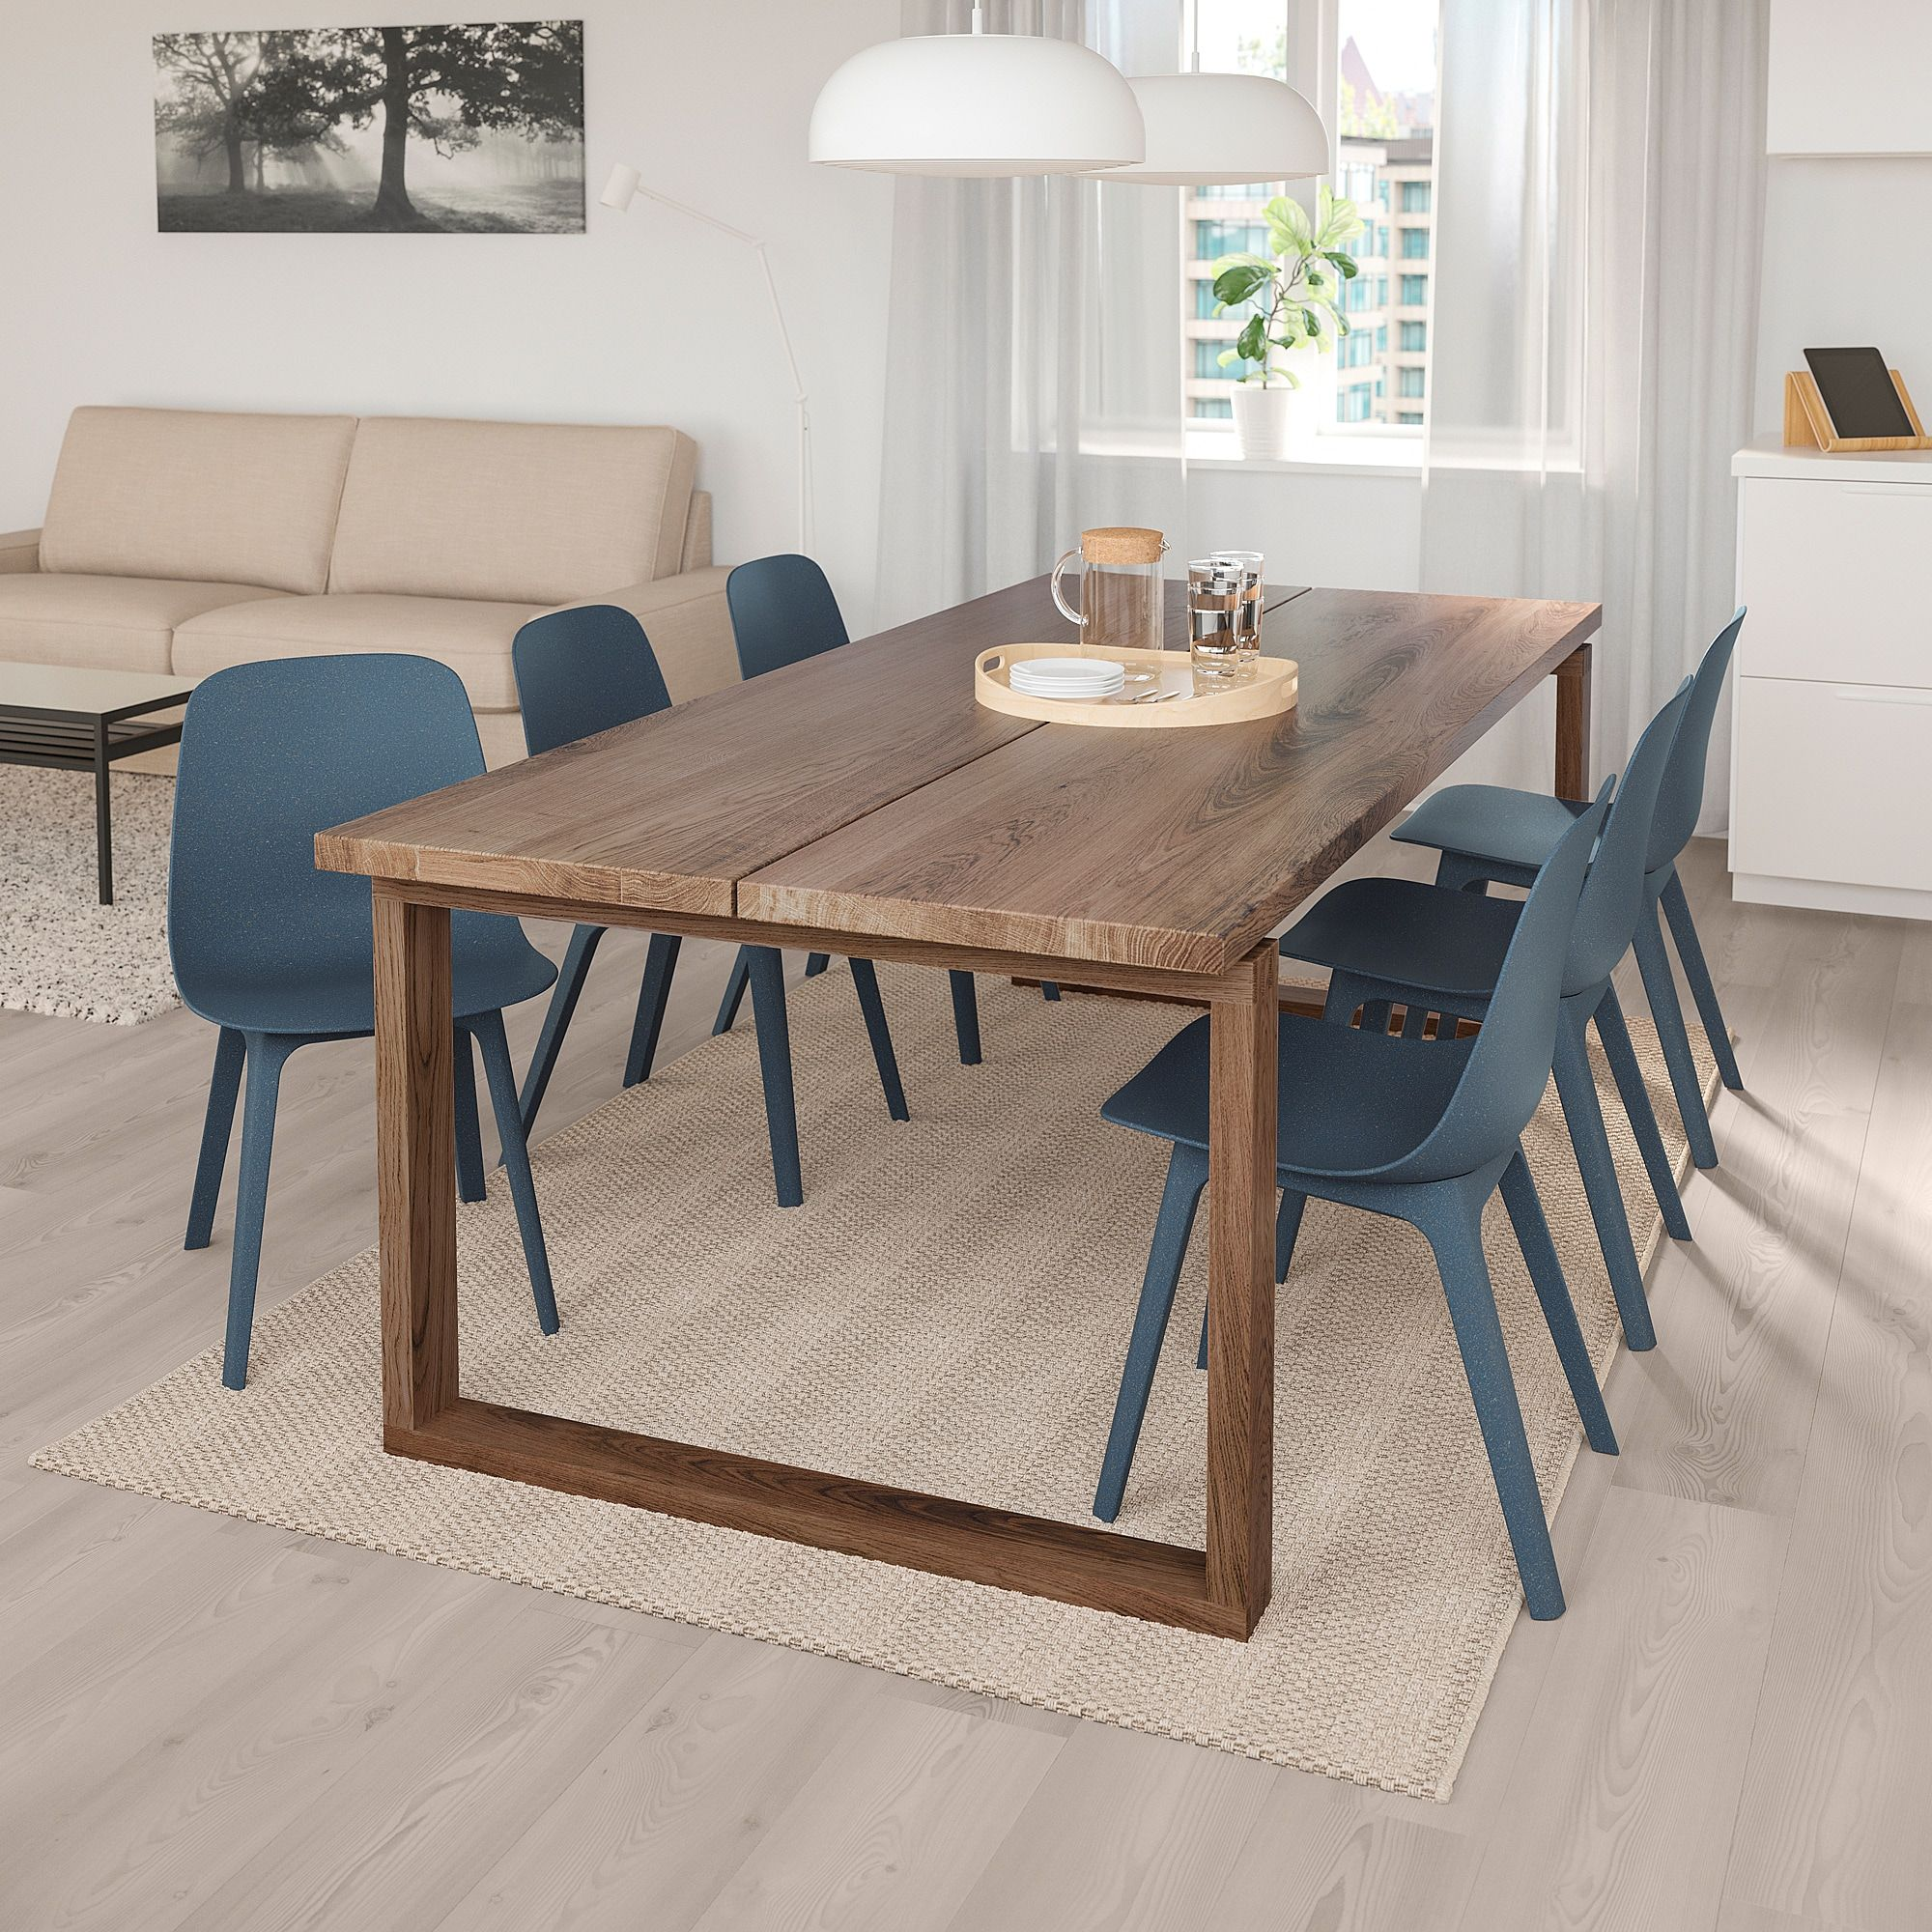 Table A Manger Ikea En Bois ikea - mÖrbylÅnga / odger table and 6 chairs en 2020